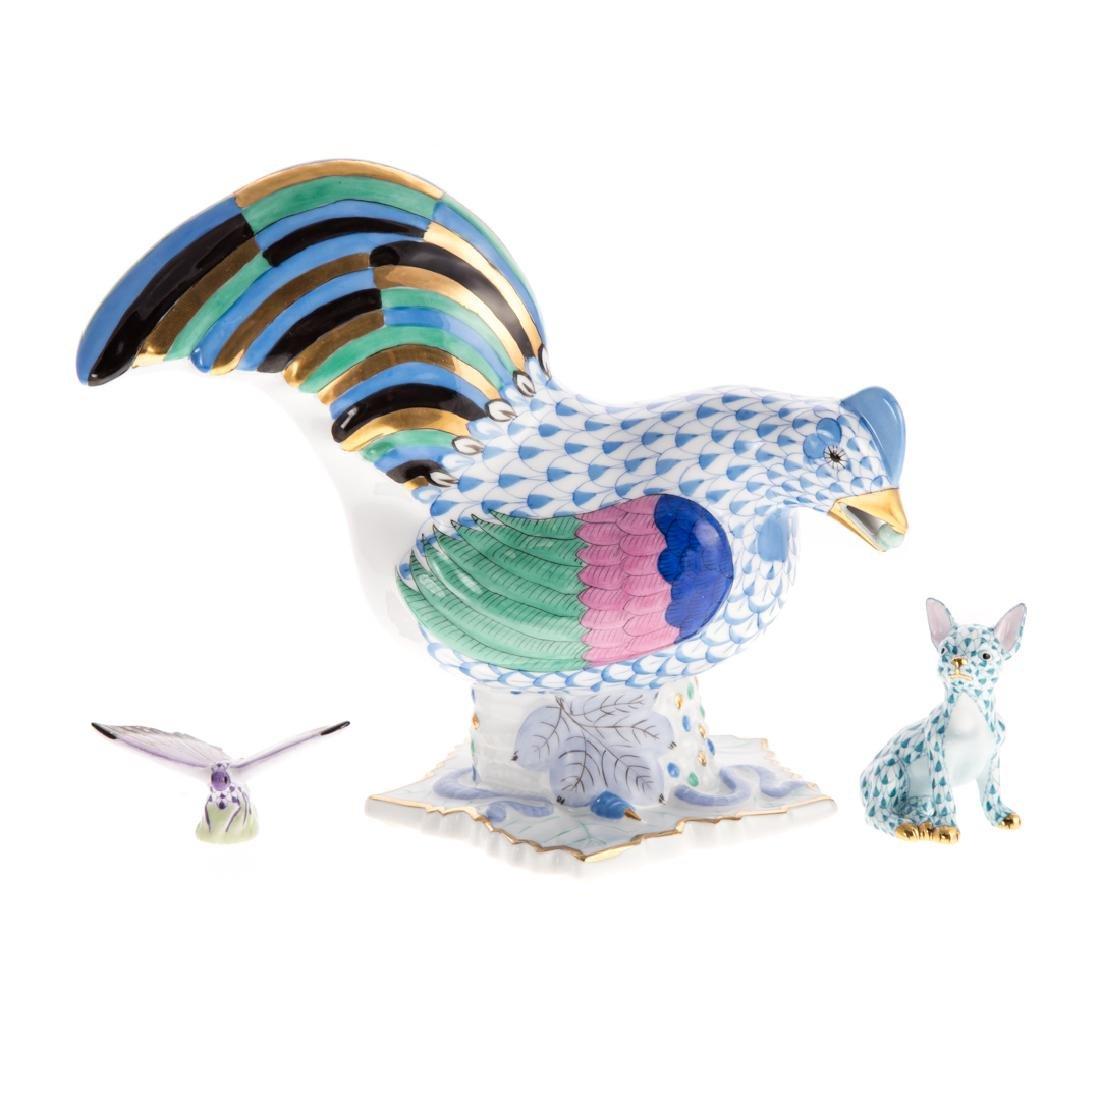 Three Herend porcelain animals